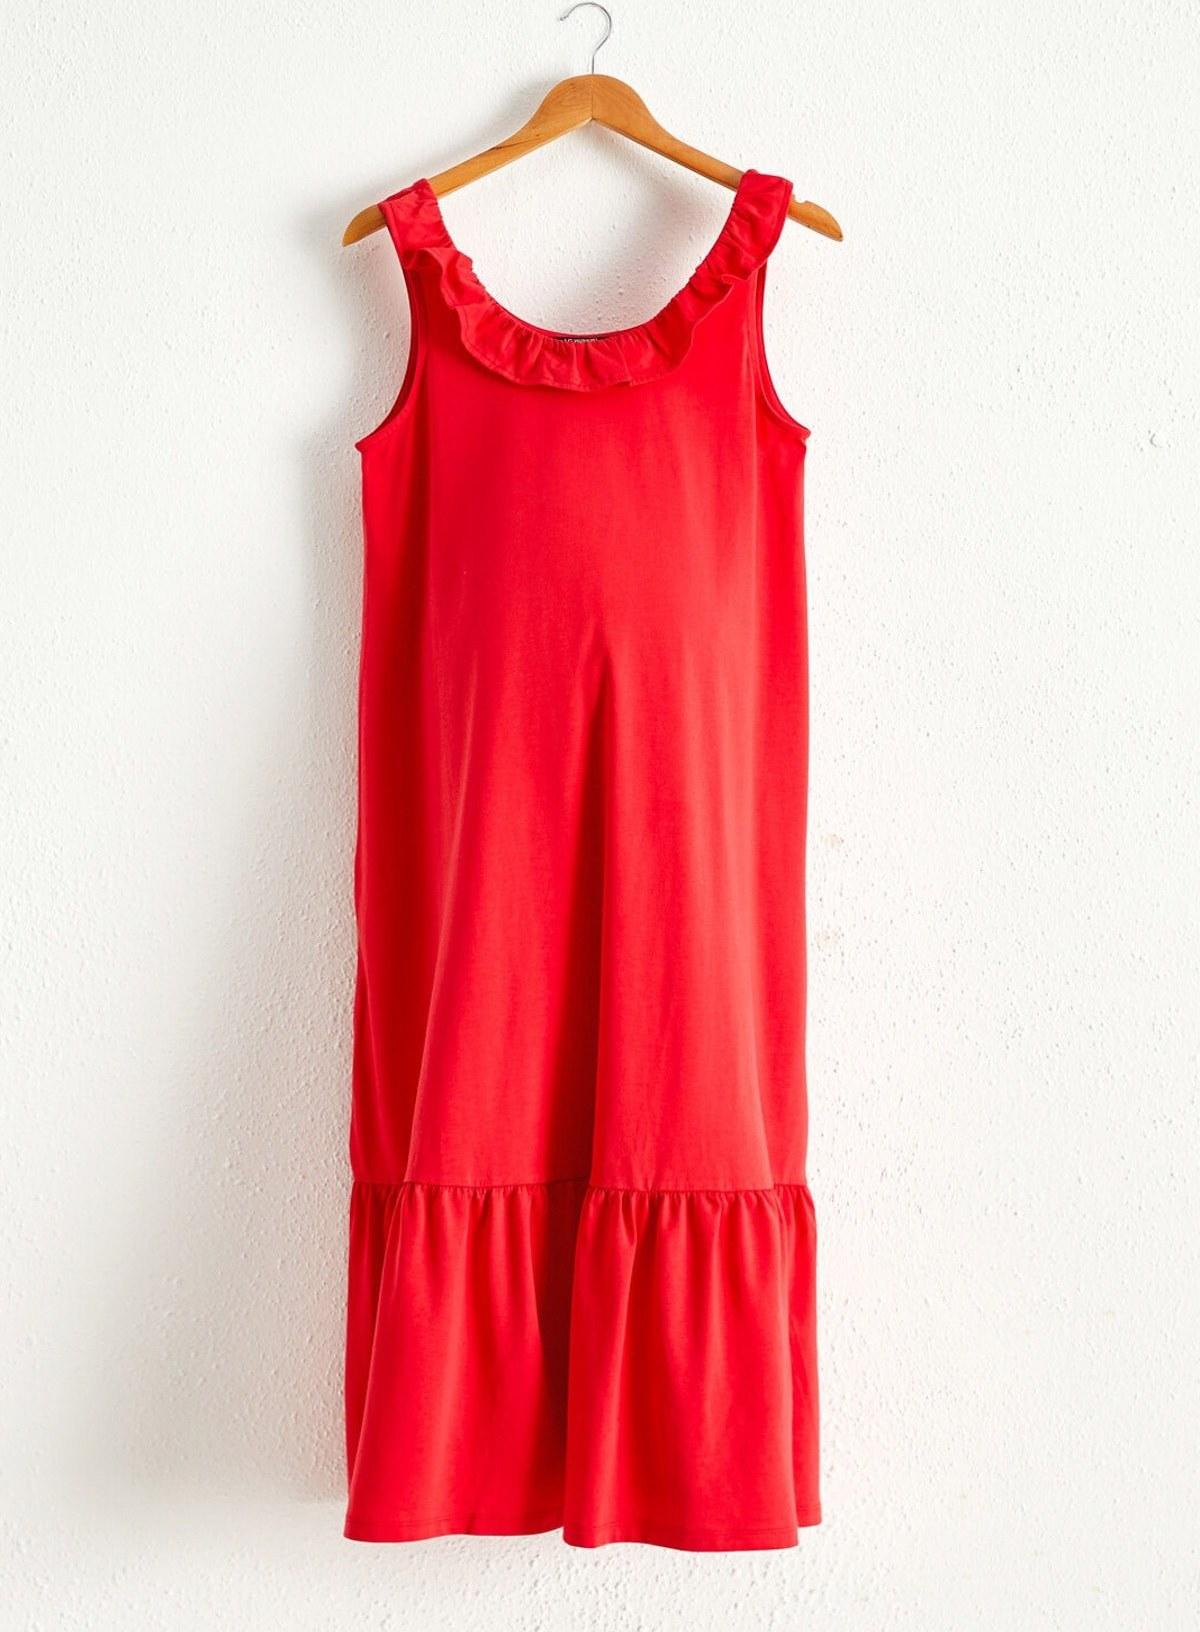 پیراهن زنانه قرمز برند LC Waikiki کد 1599540402